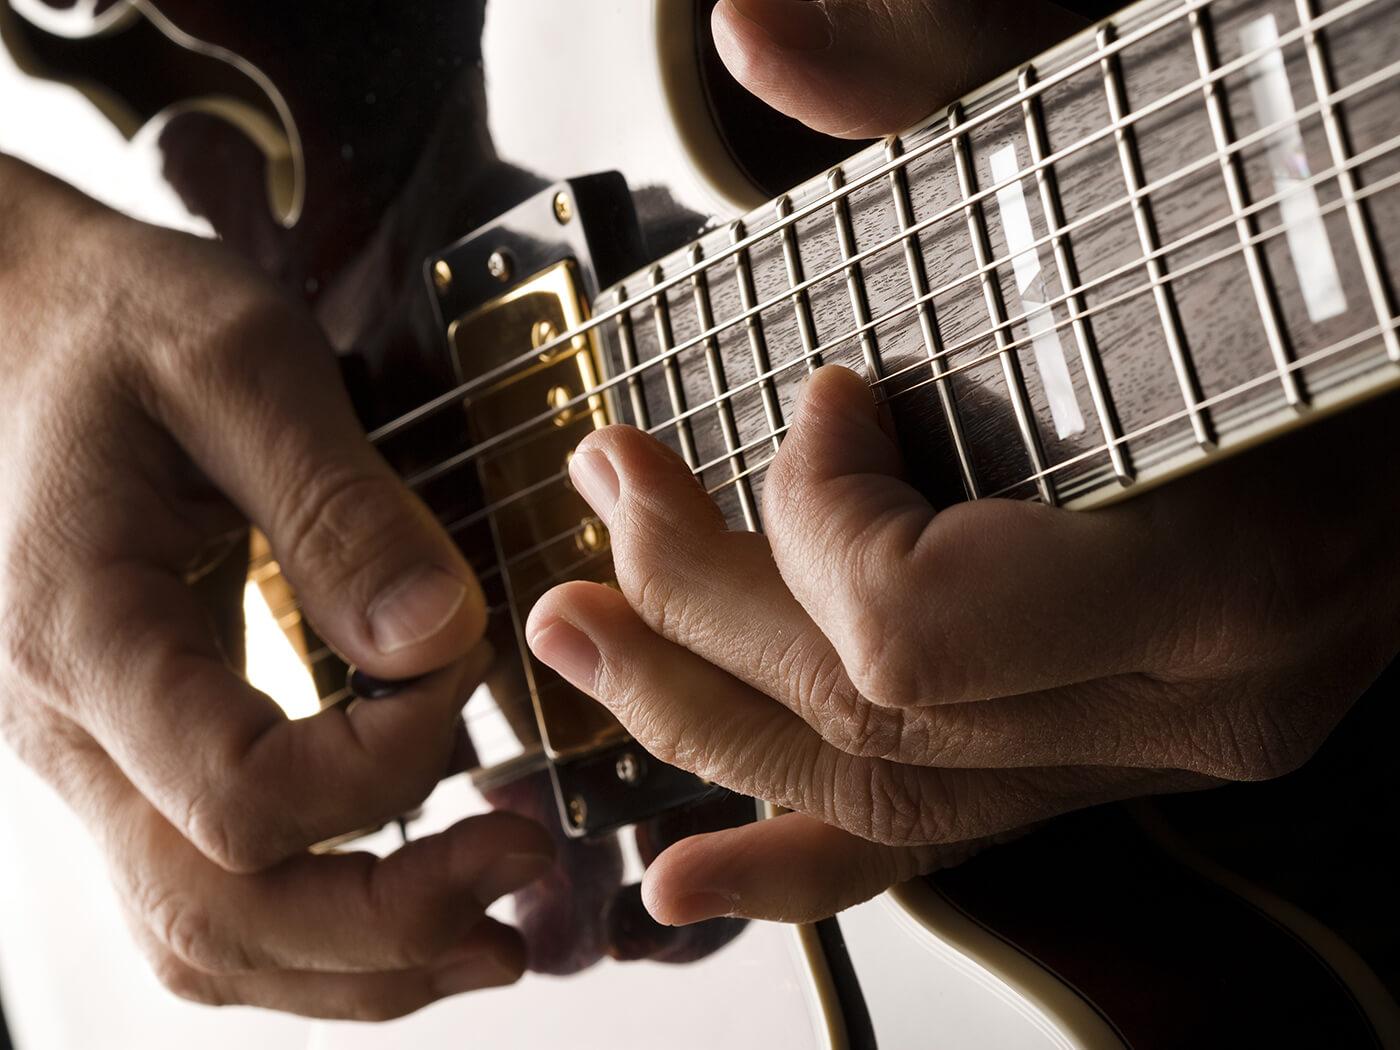 Blues guitar string bending